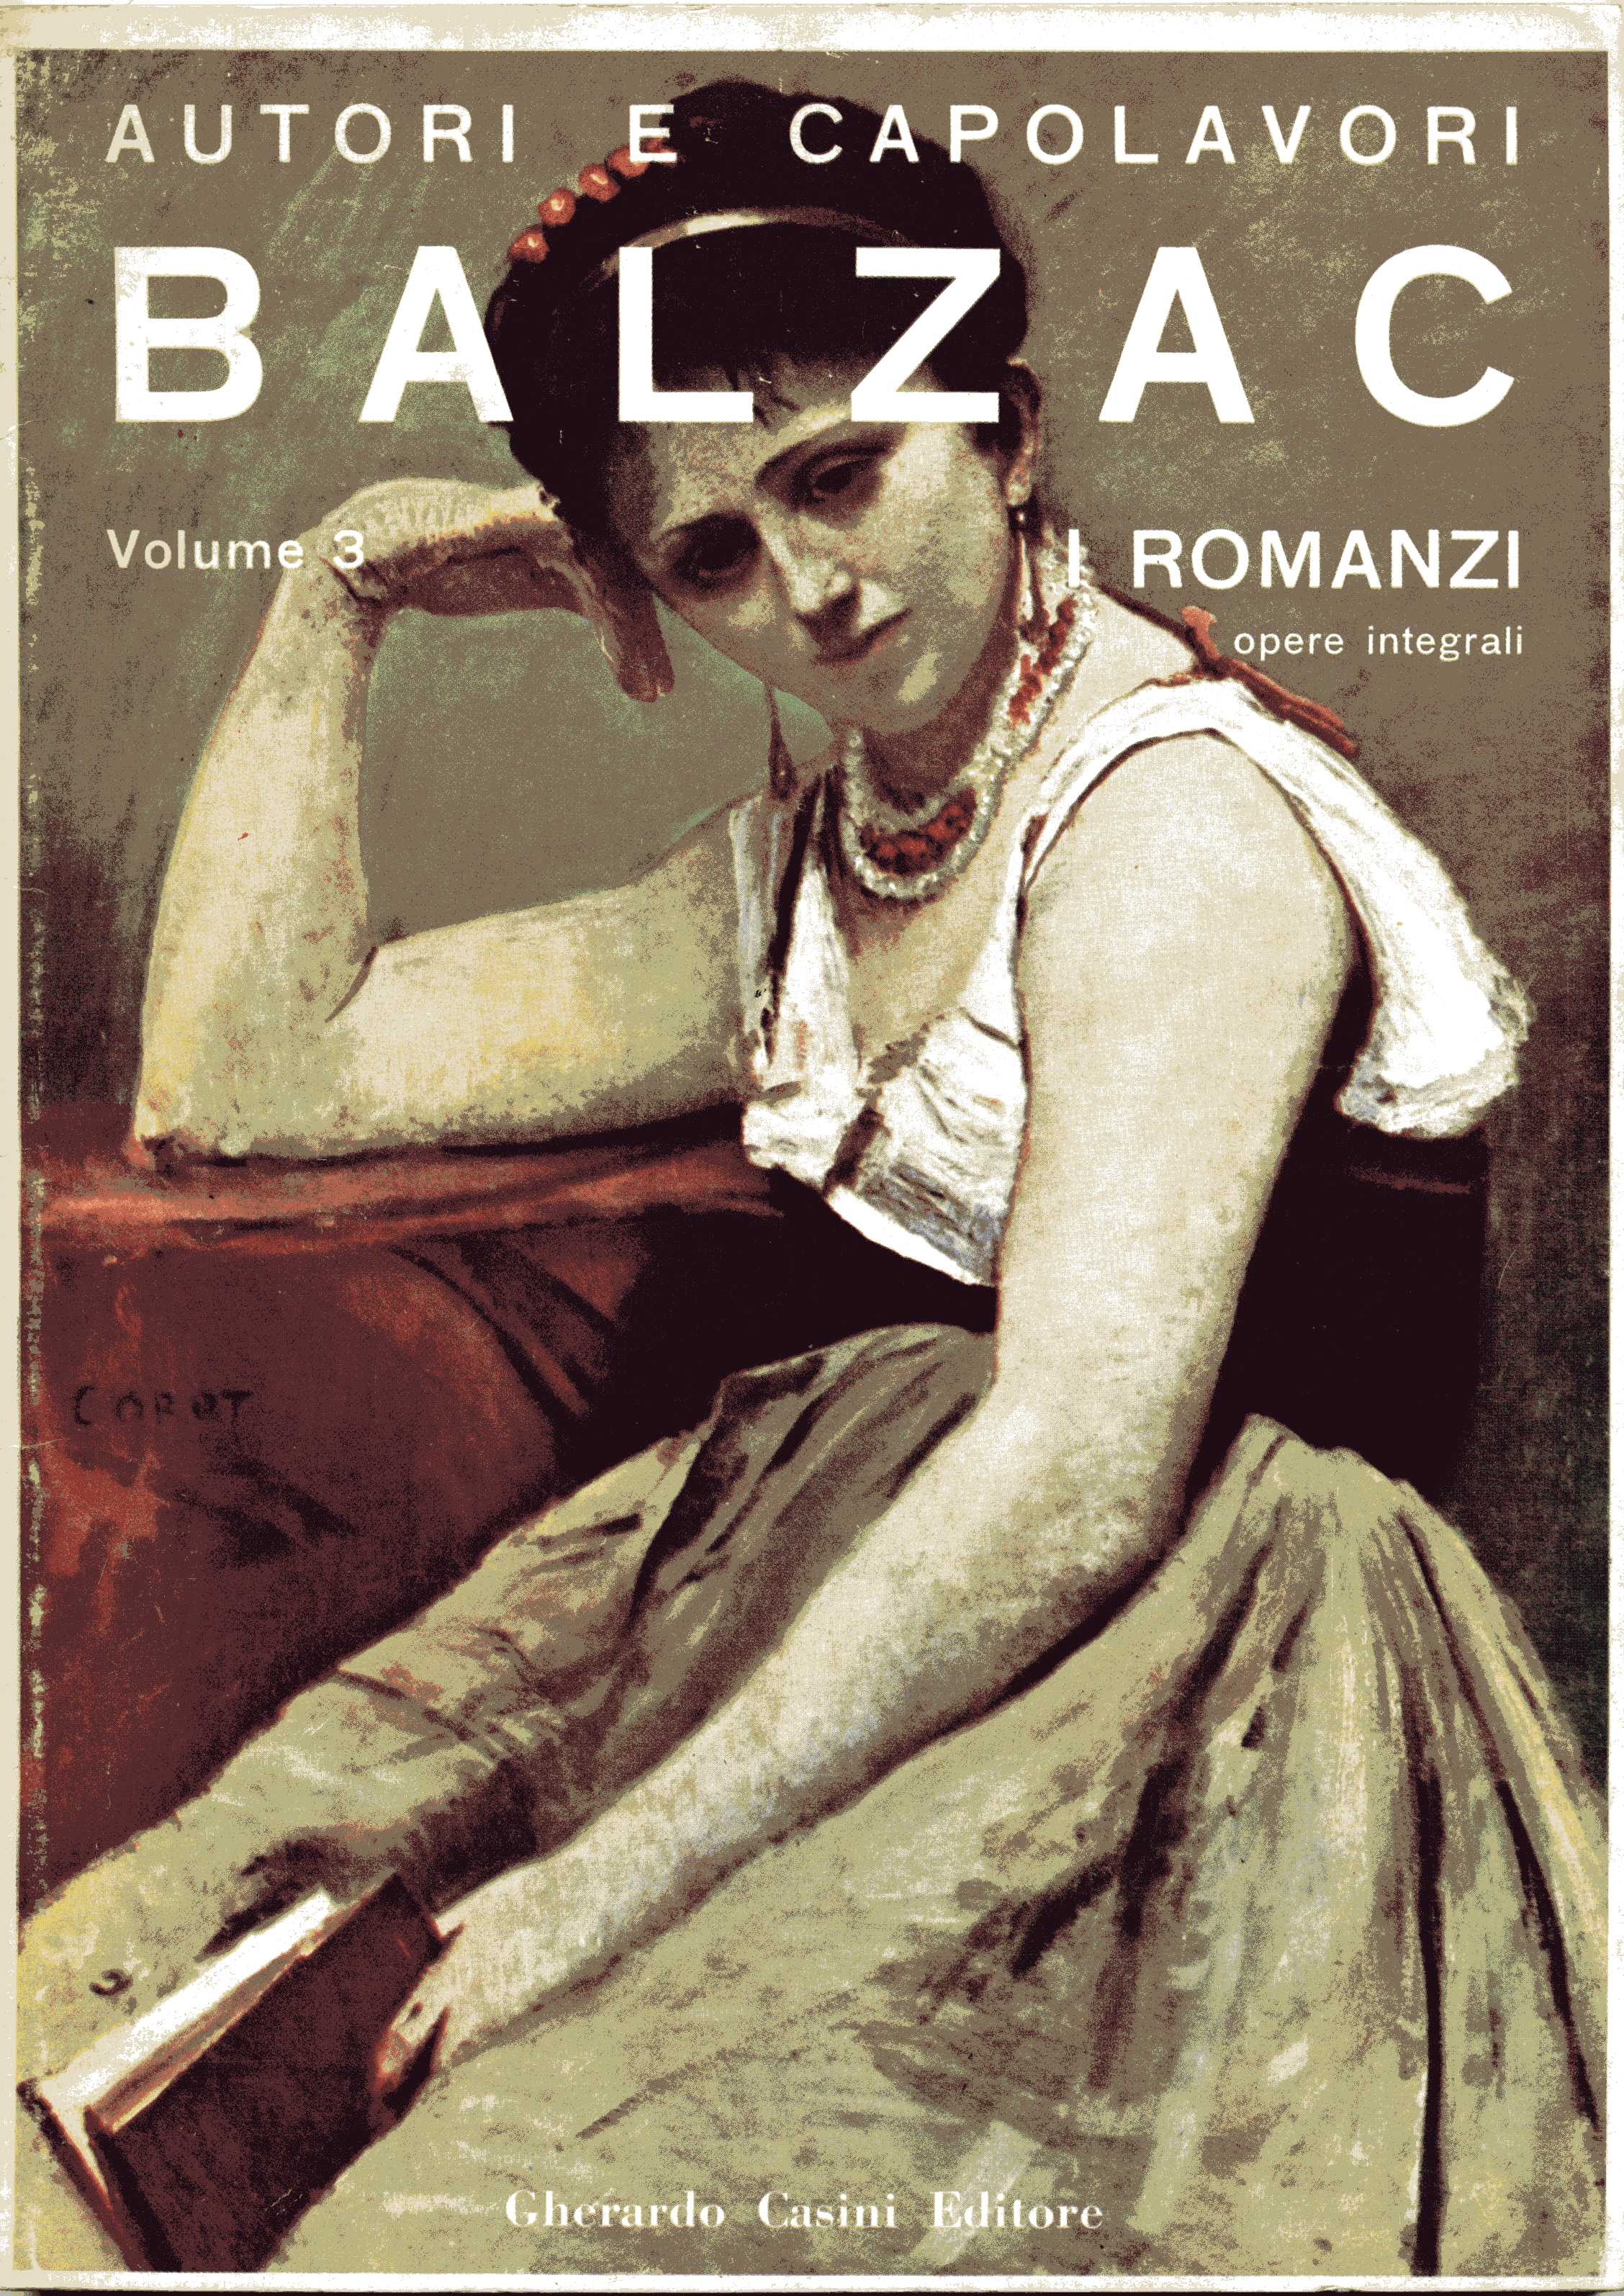 I Romanzi vol. III